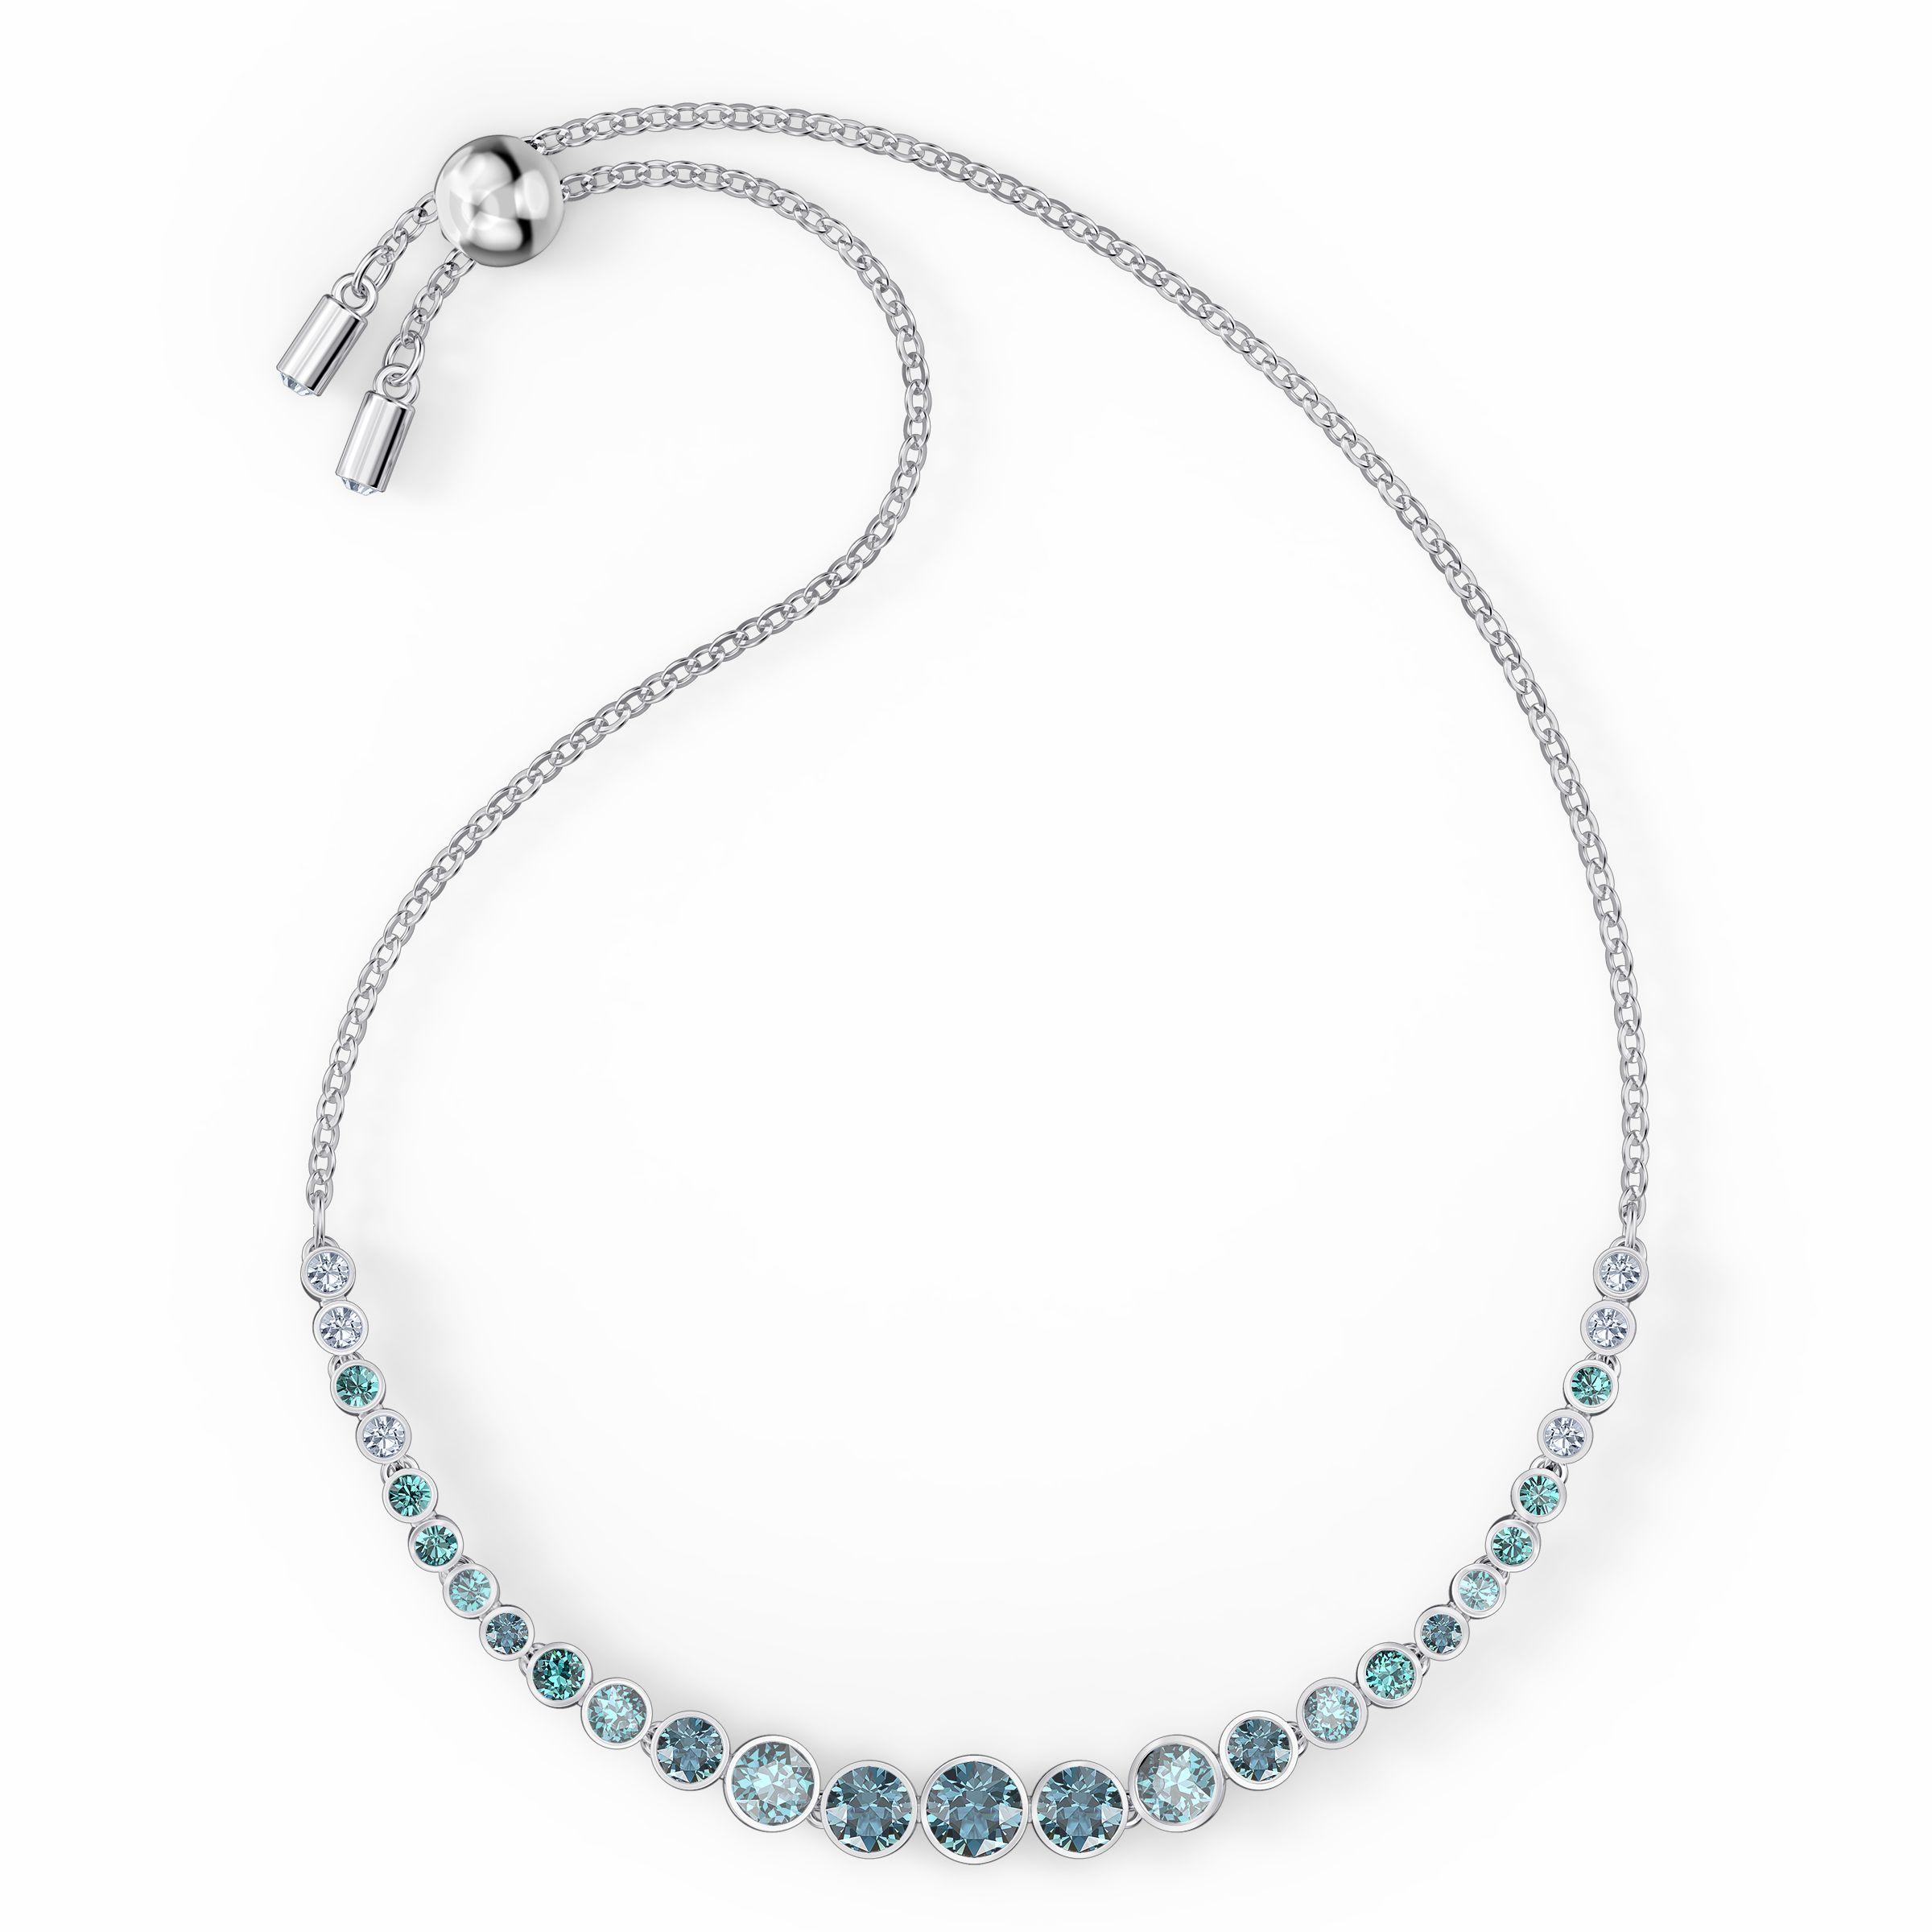 Bracelet Emily Gradient, bleu, métal rhodié, Swarovski